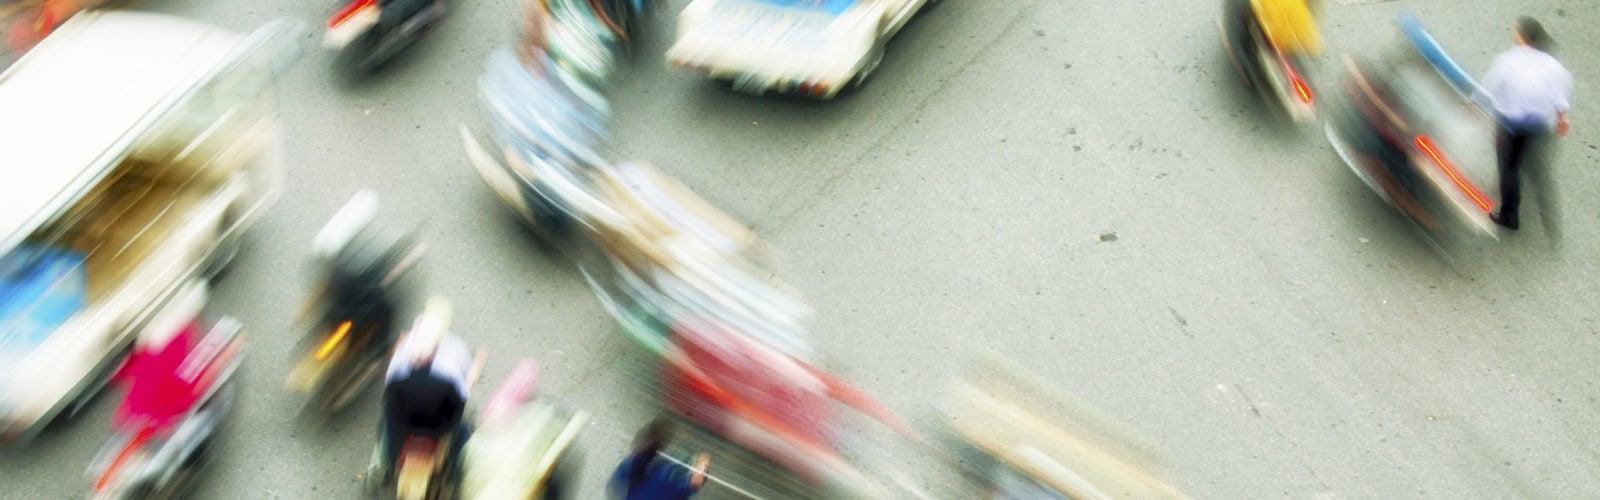 hanoi-moving-traffic